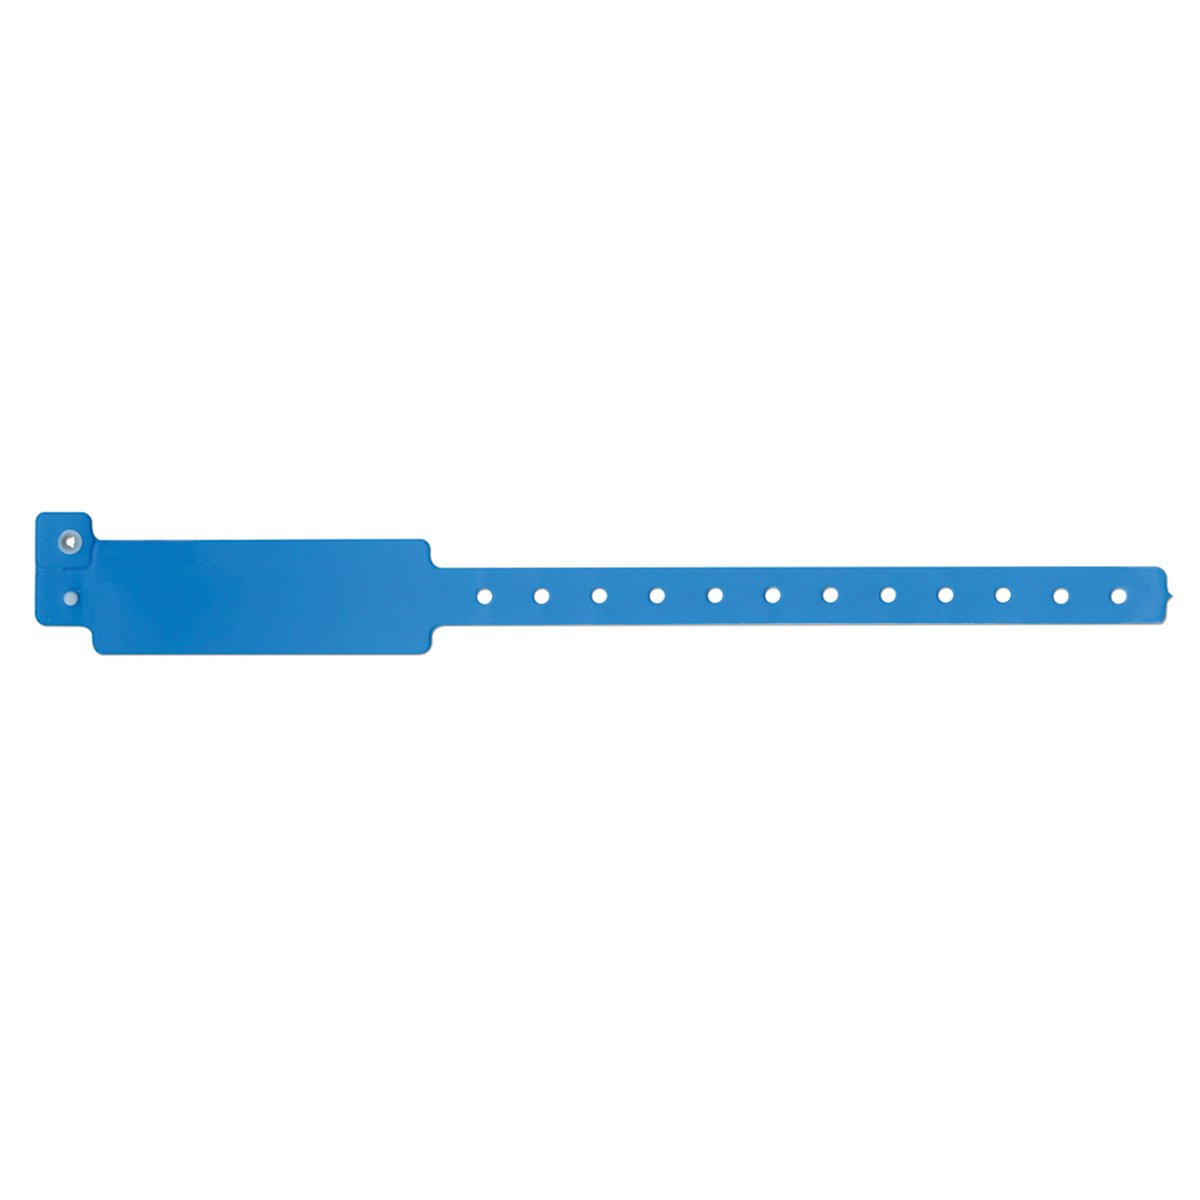 SPEEDI-BAND 420-13-PDM Write-On Wristband, Vinyl Clasp Closure, 1'' x 10'', Adult/Pediatric, Blue (Pack of 500)